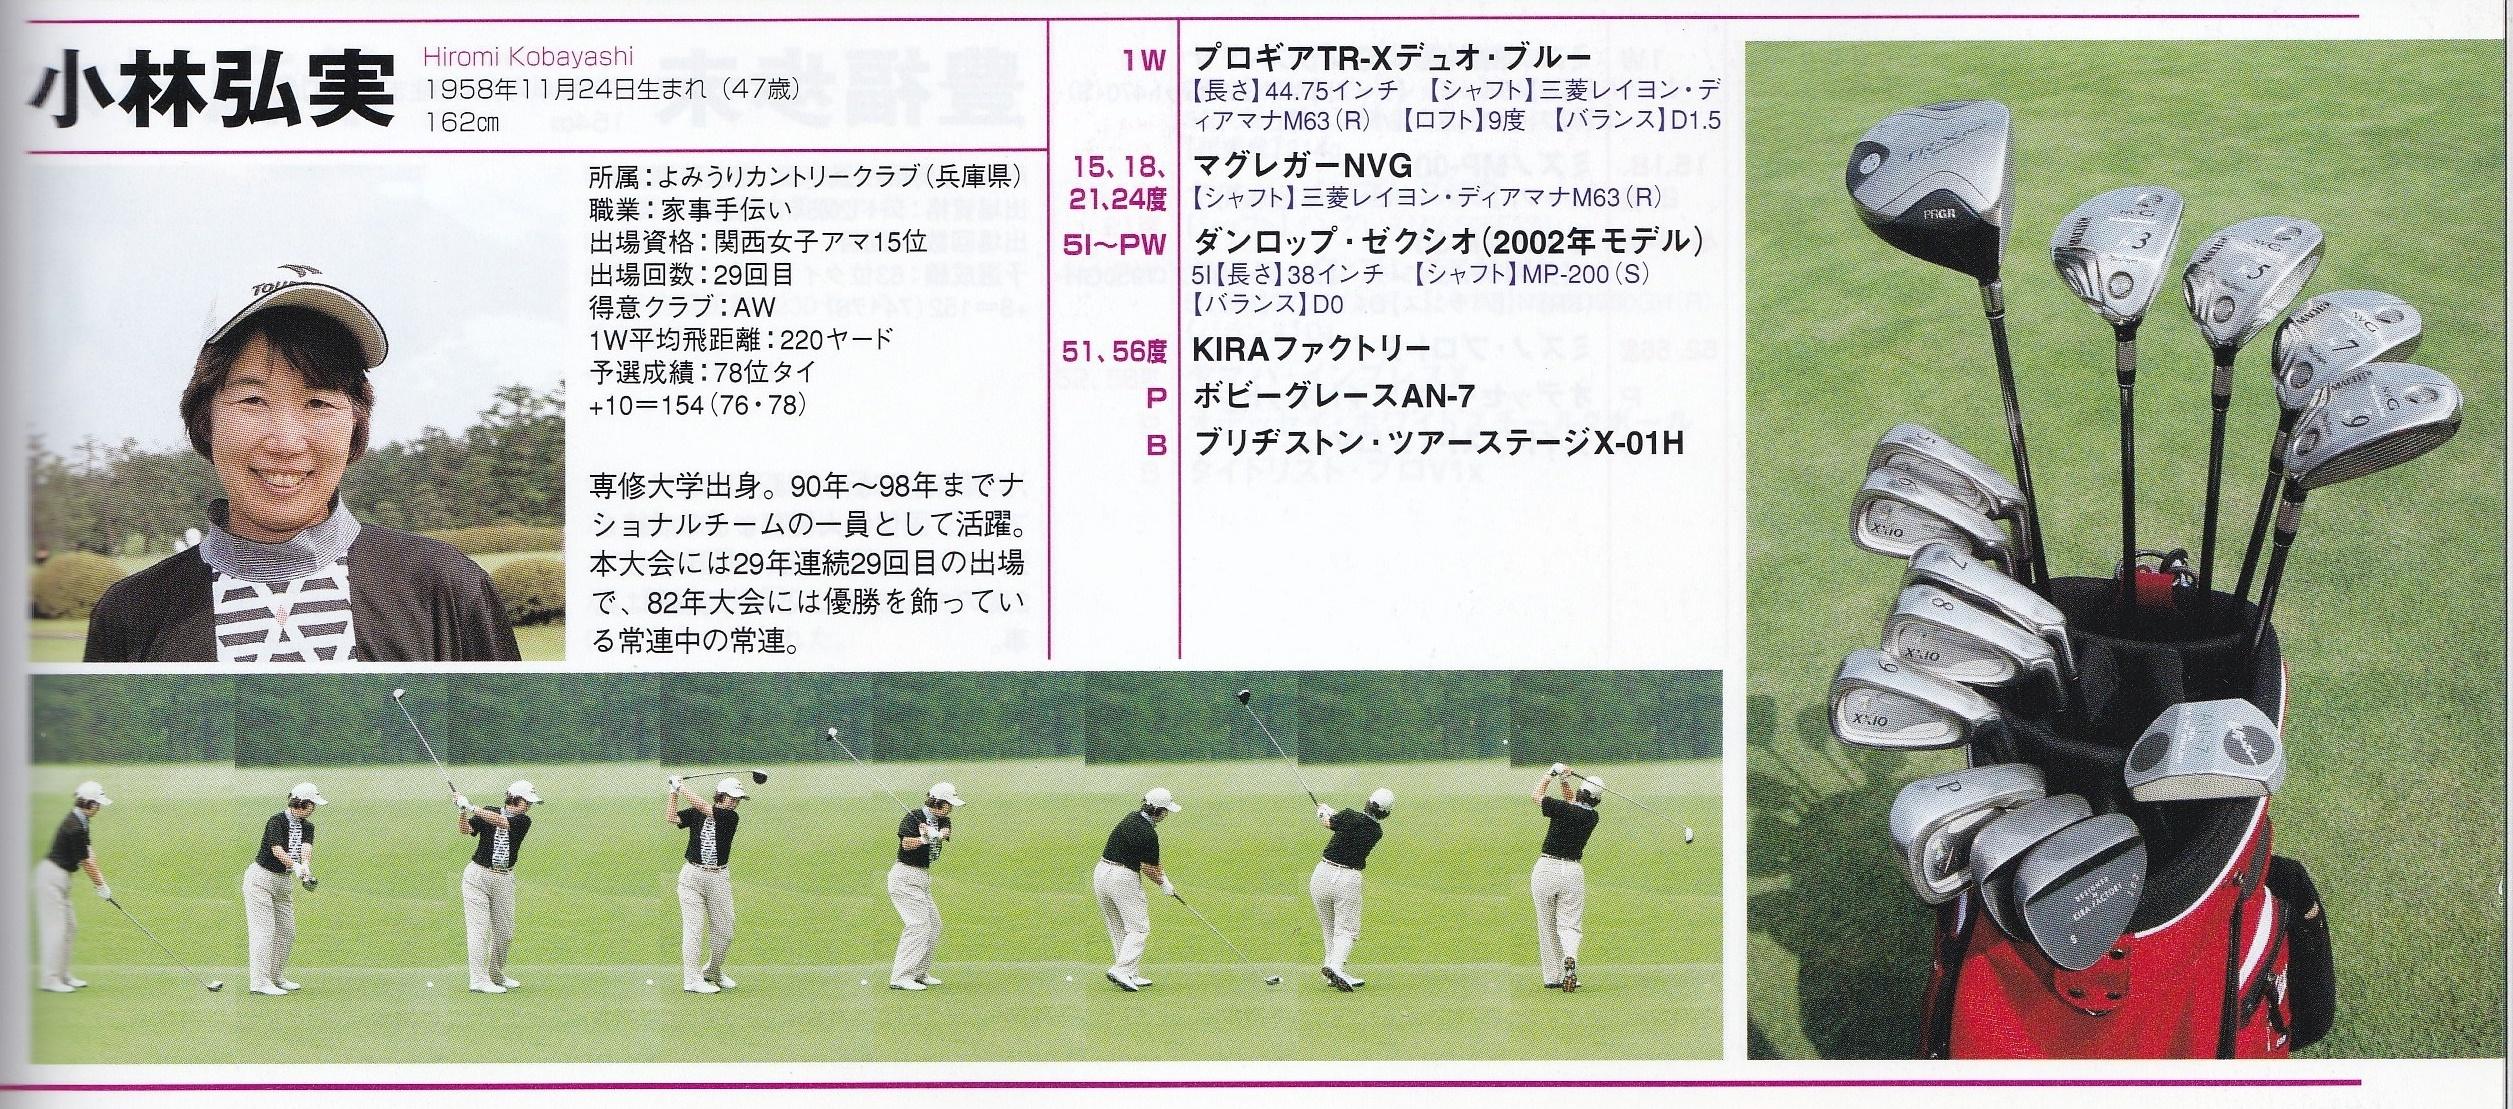 2006.9 Golf Style Japan women's amateur club's setting